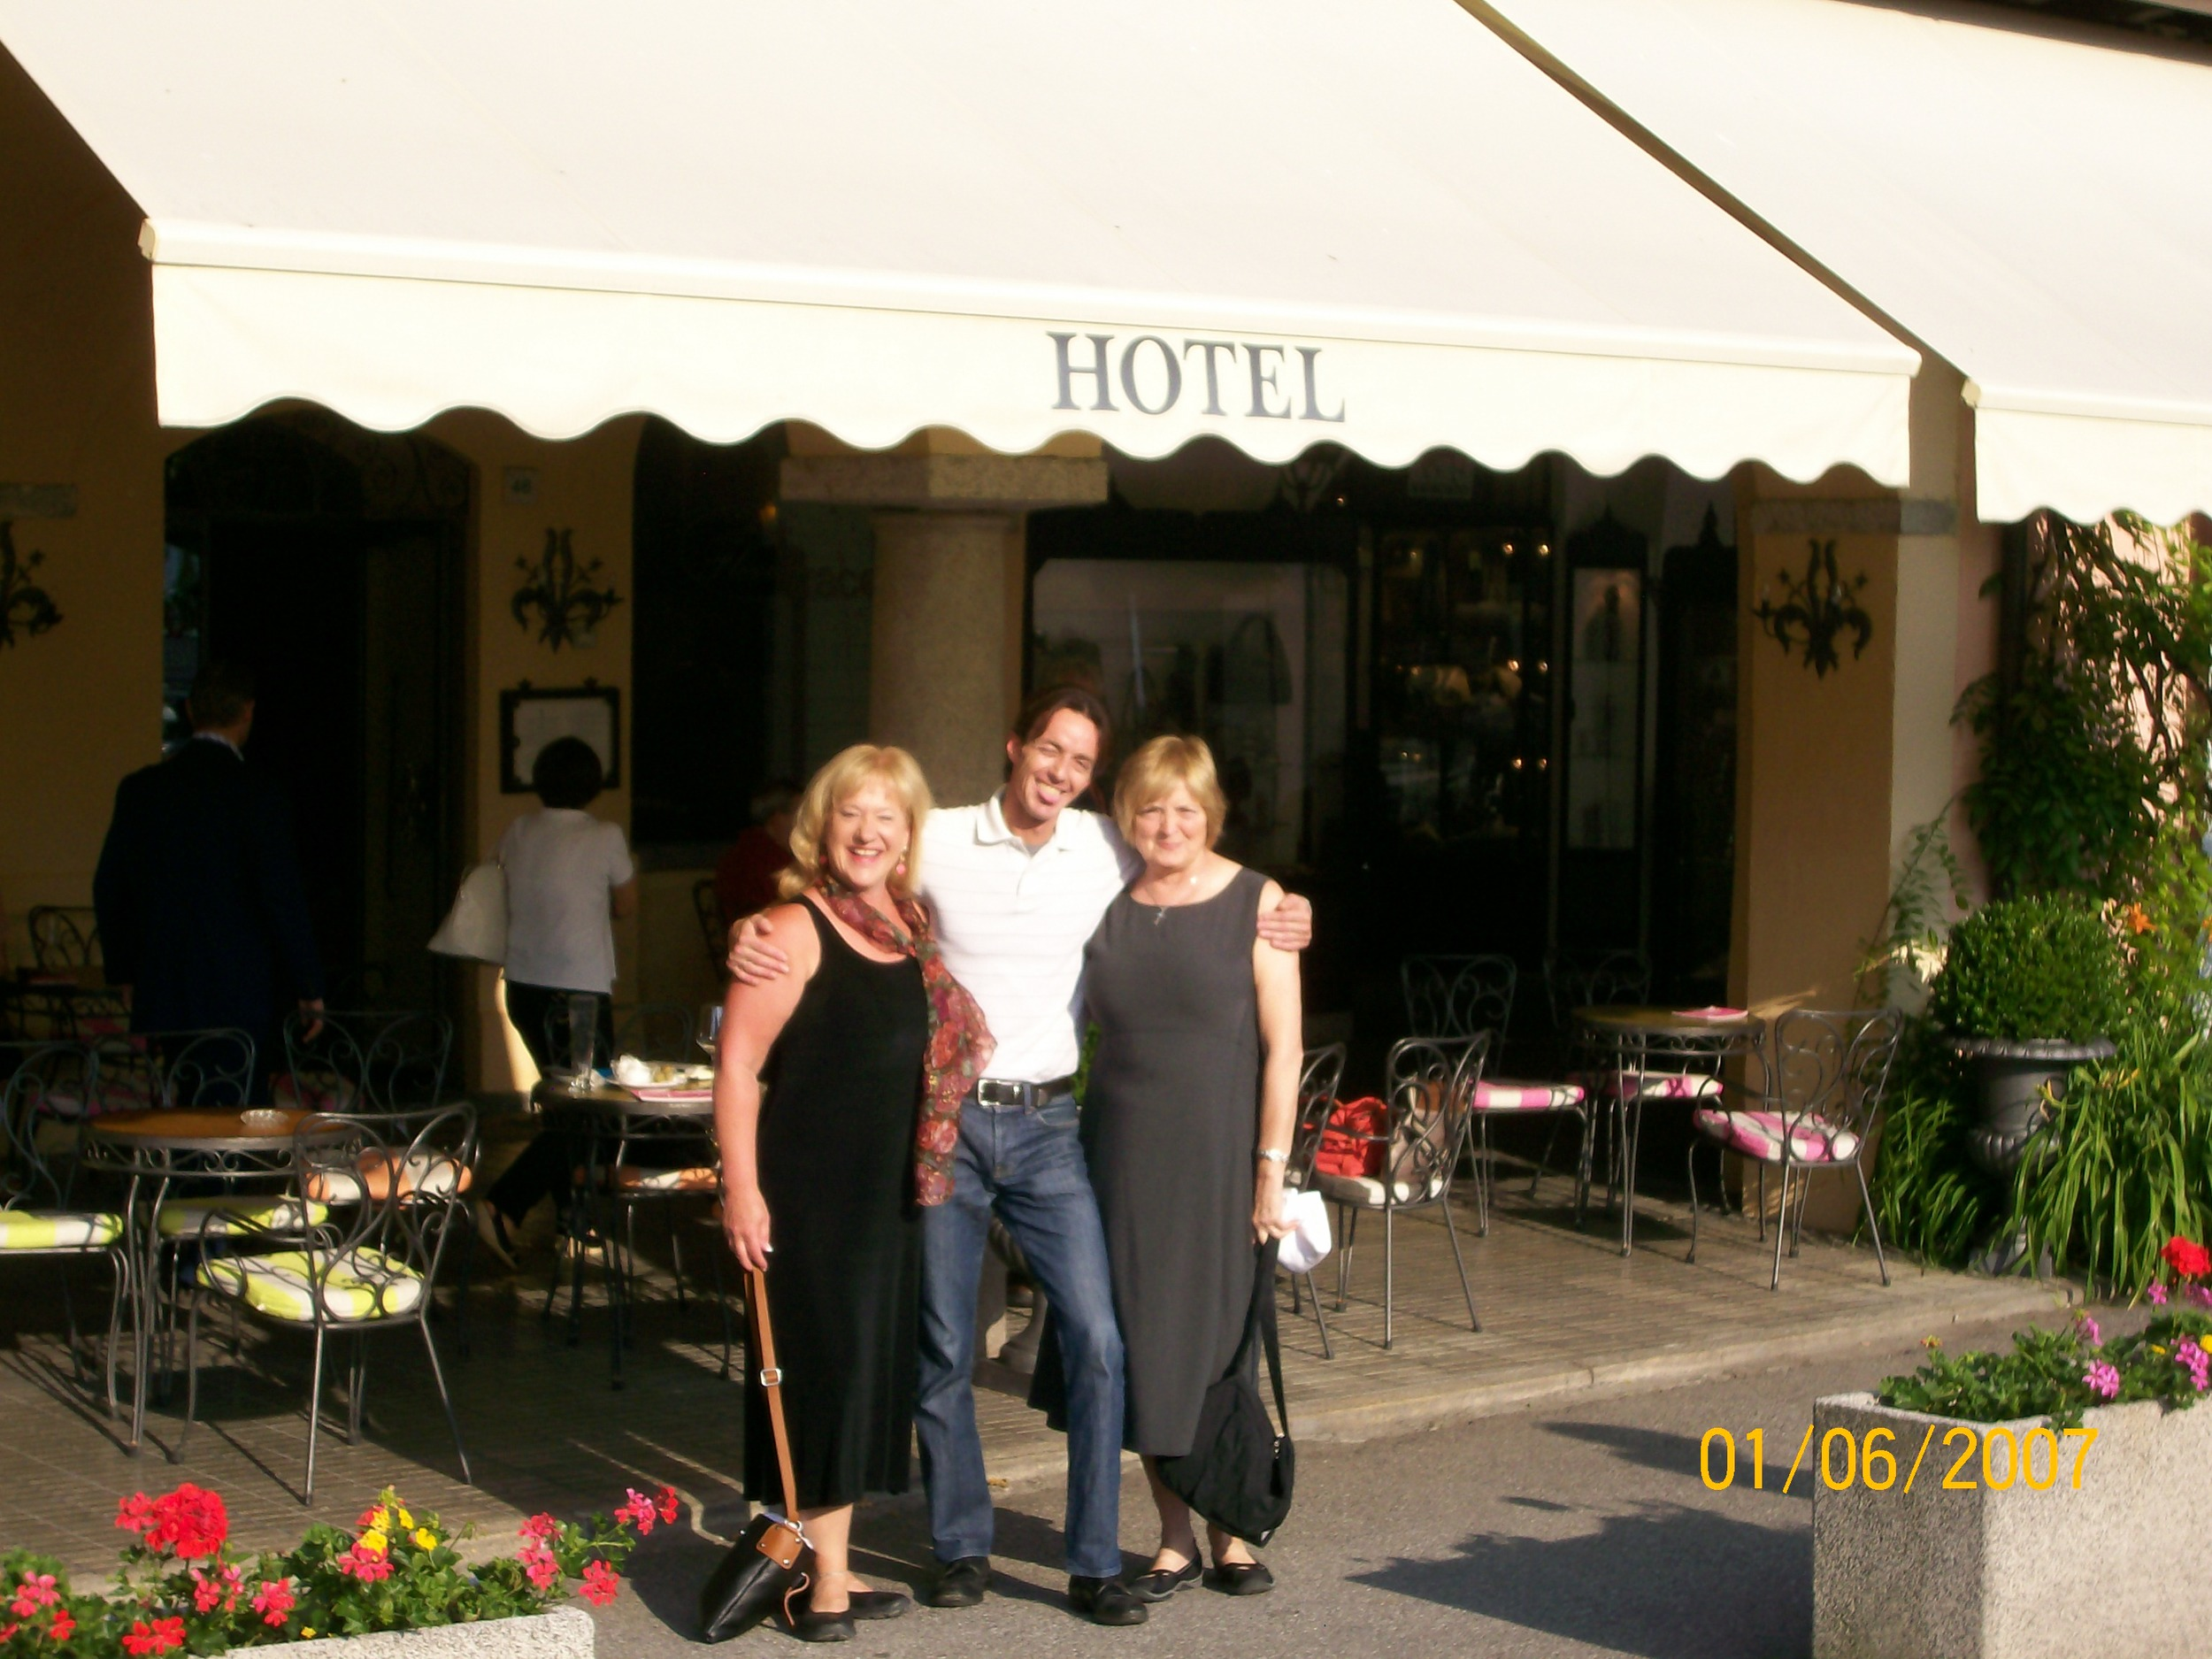 Hotel Florence, Bellagio